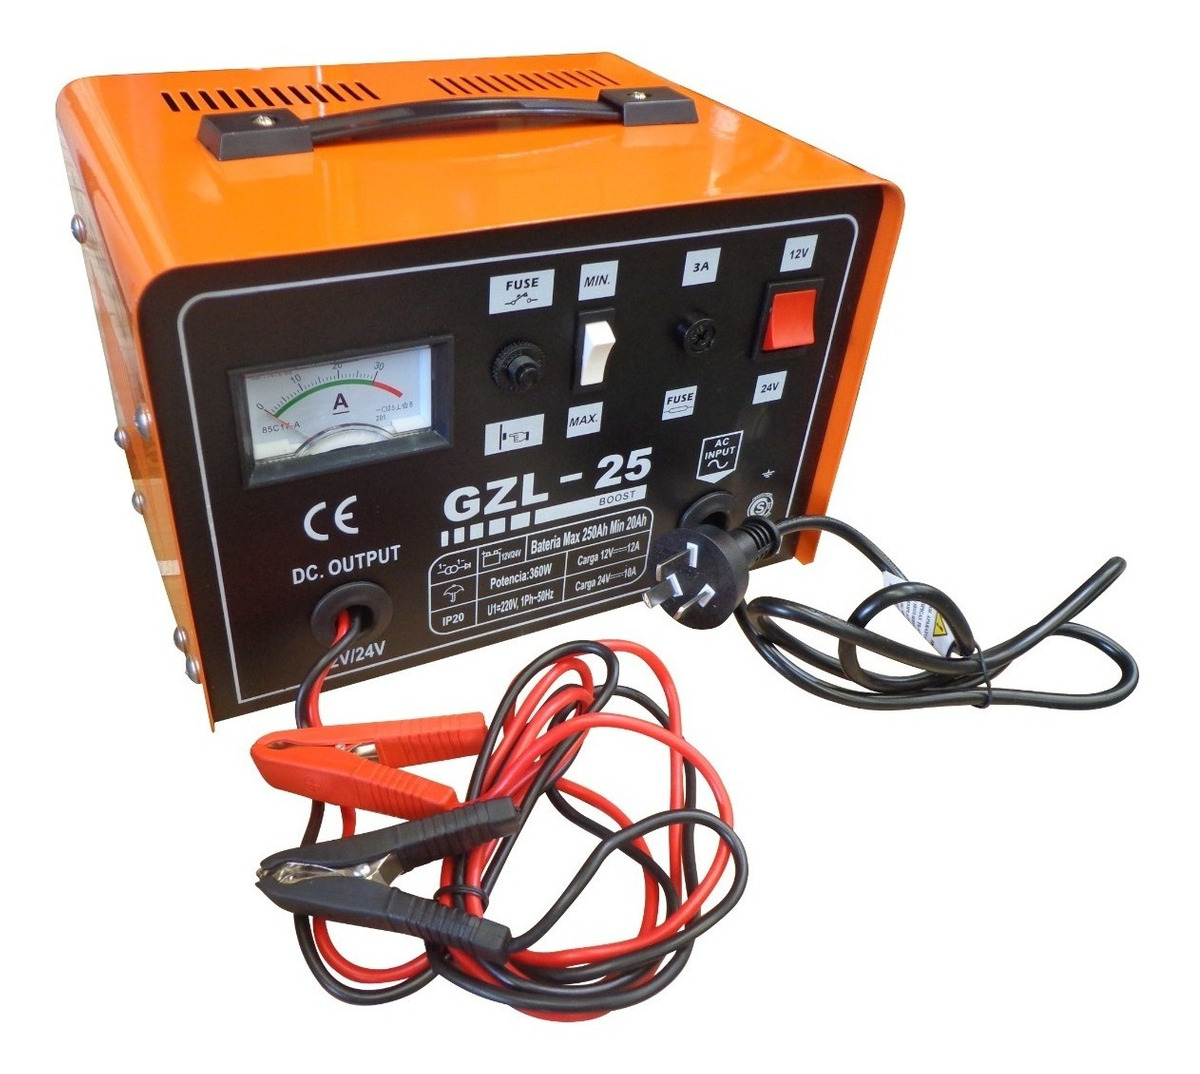 be68b7c75e3 Cargador Bateria Auto 25 Amp Gzl-25 12v 24v Kushiro - $ 3.312,00 en ...